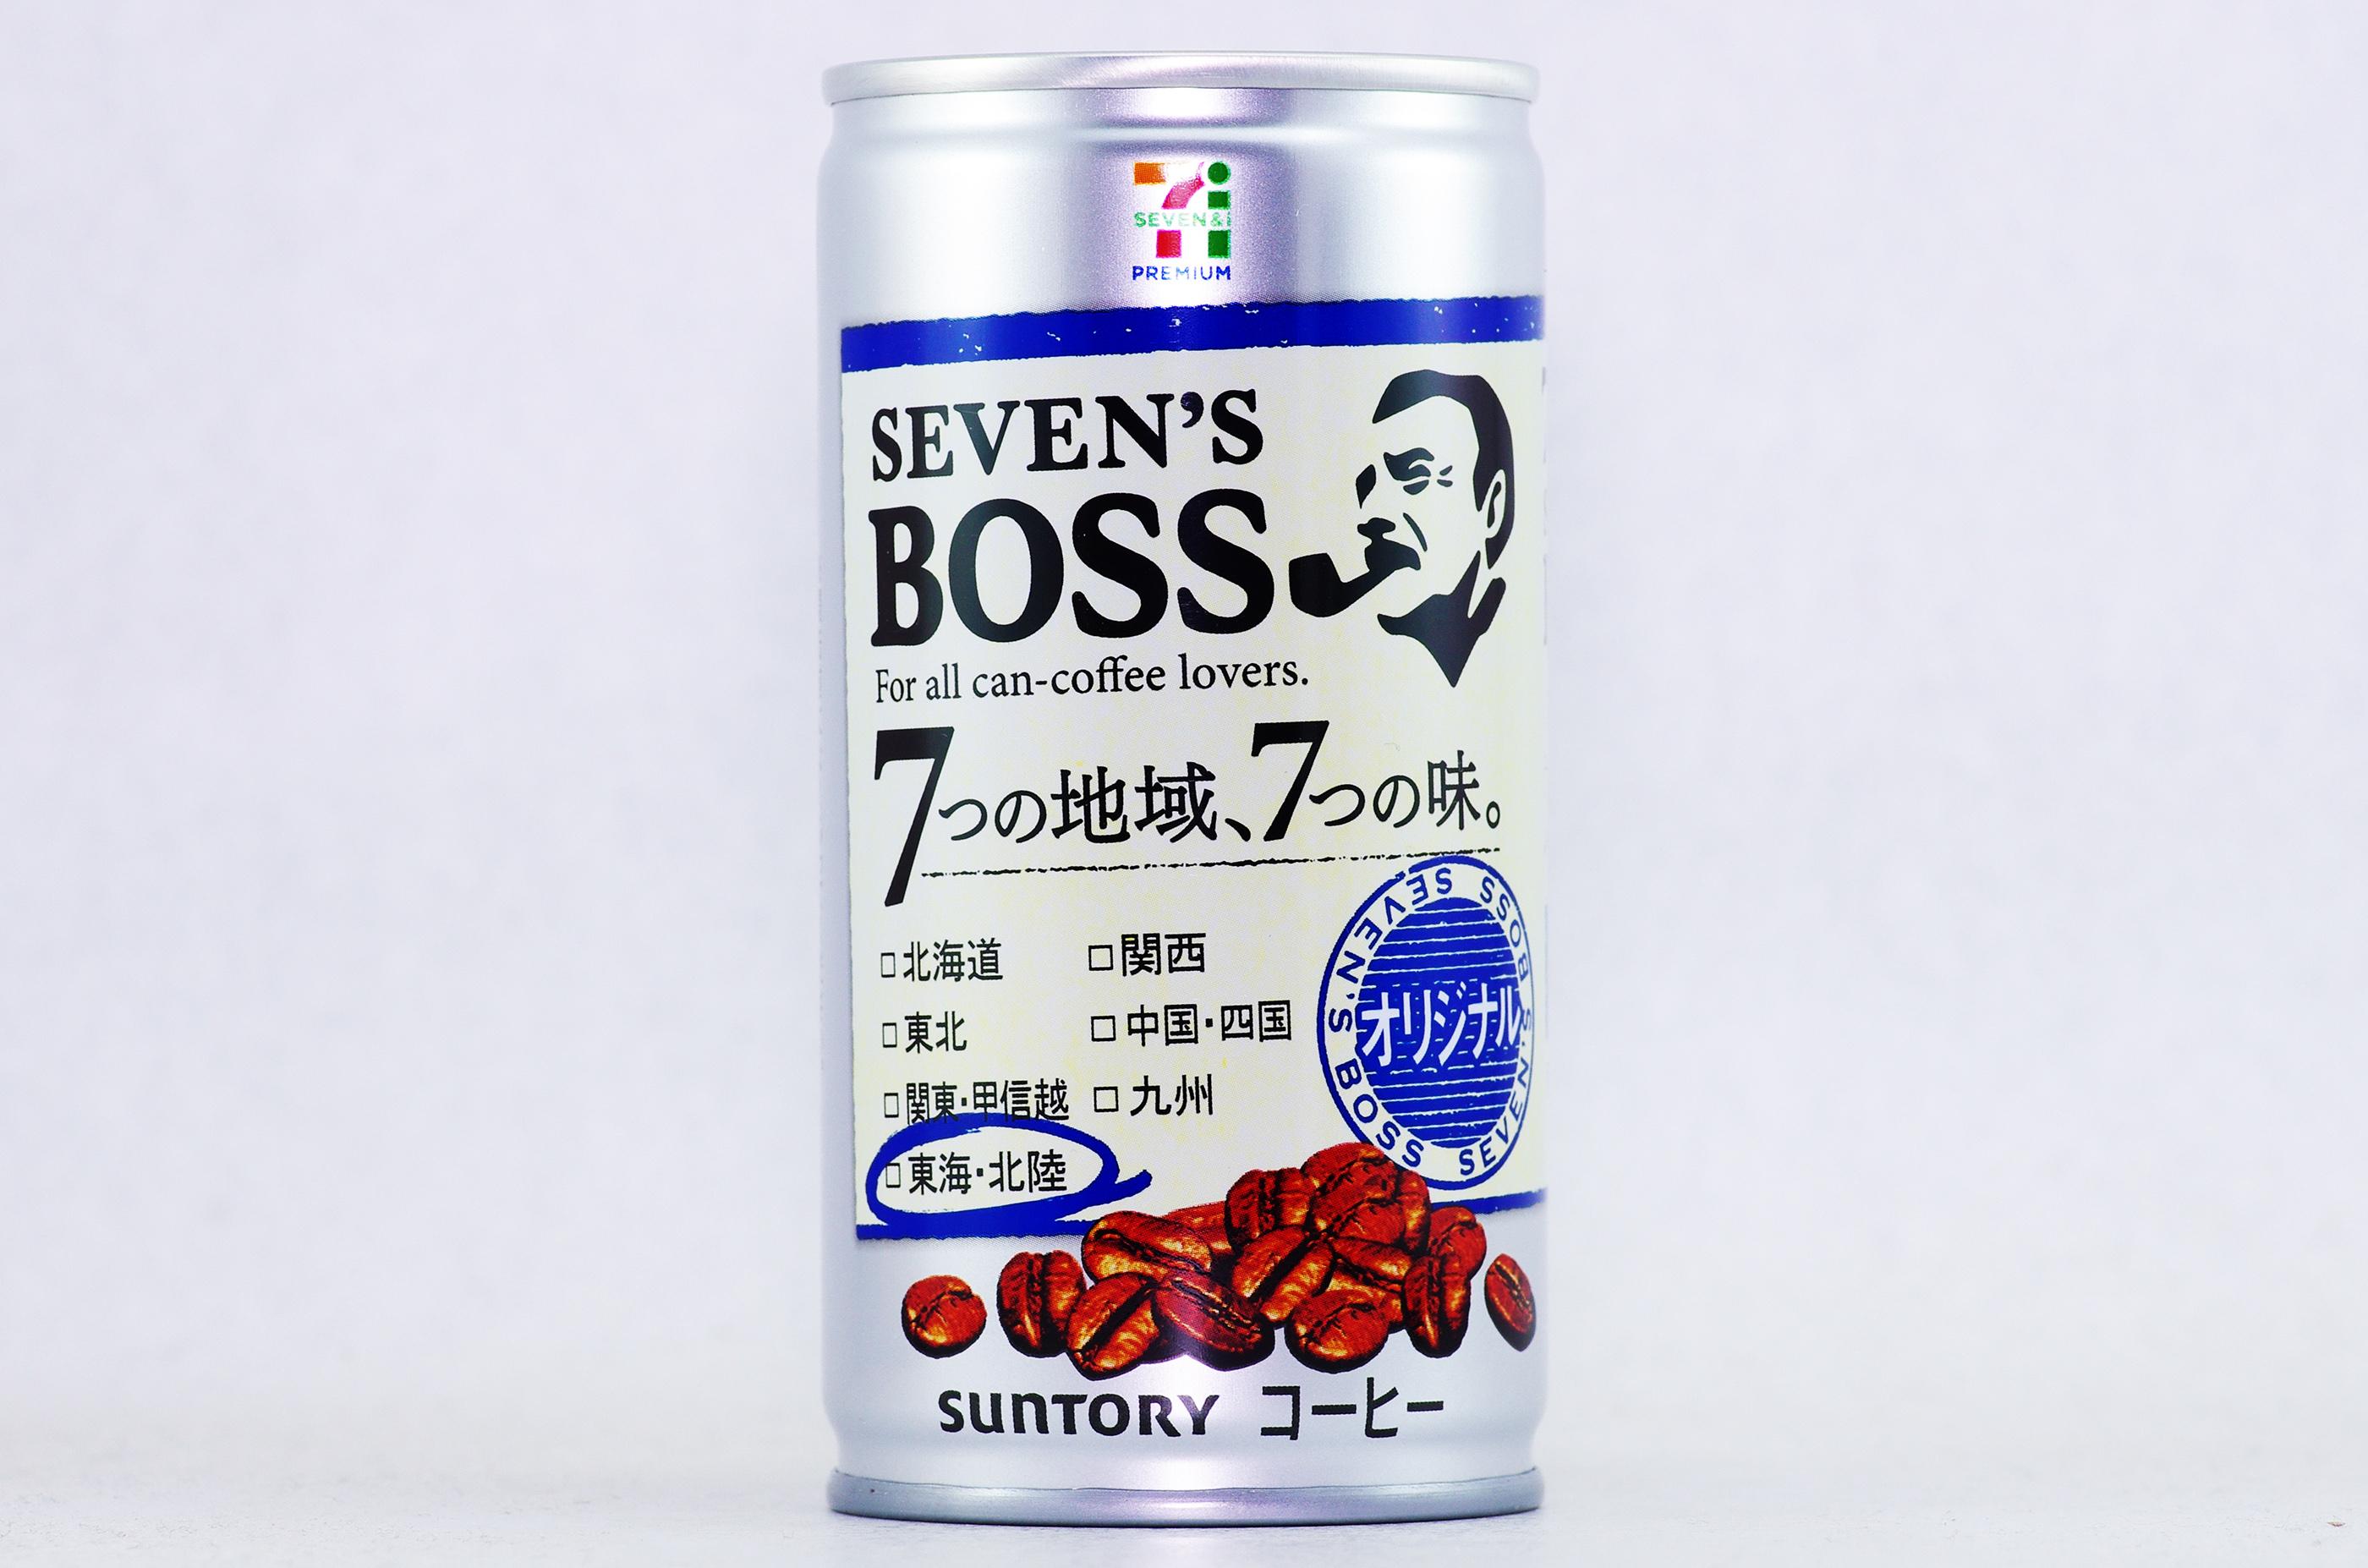 SEVEN'S BOSS オリジナル 東海・北陸限定 前回登録品